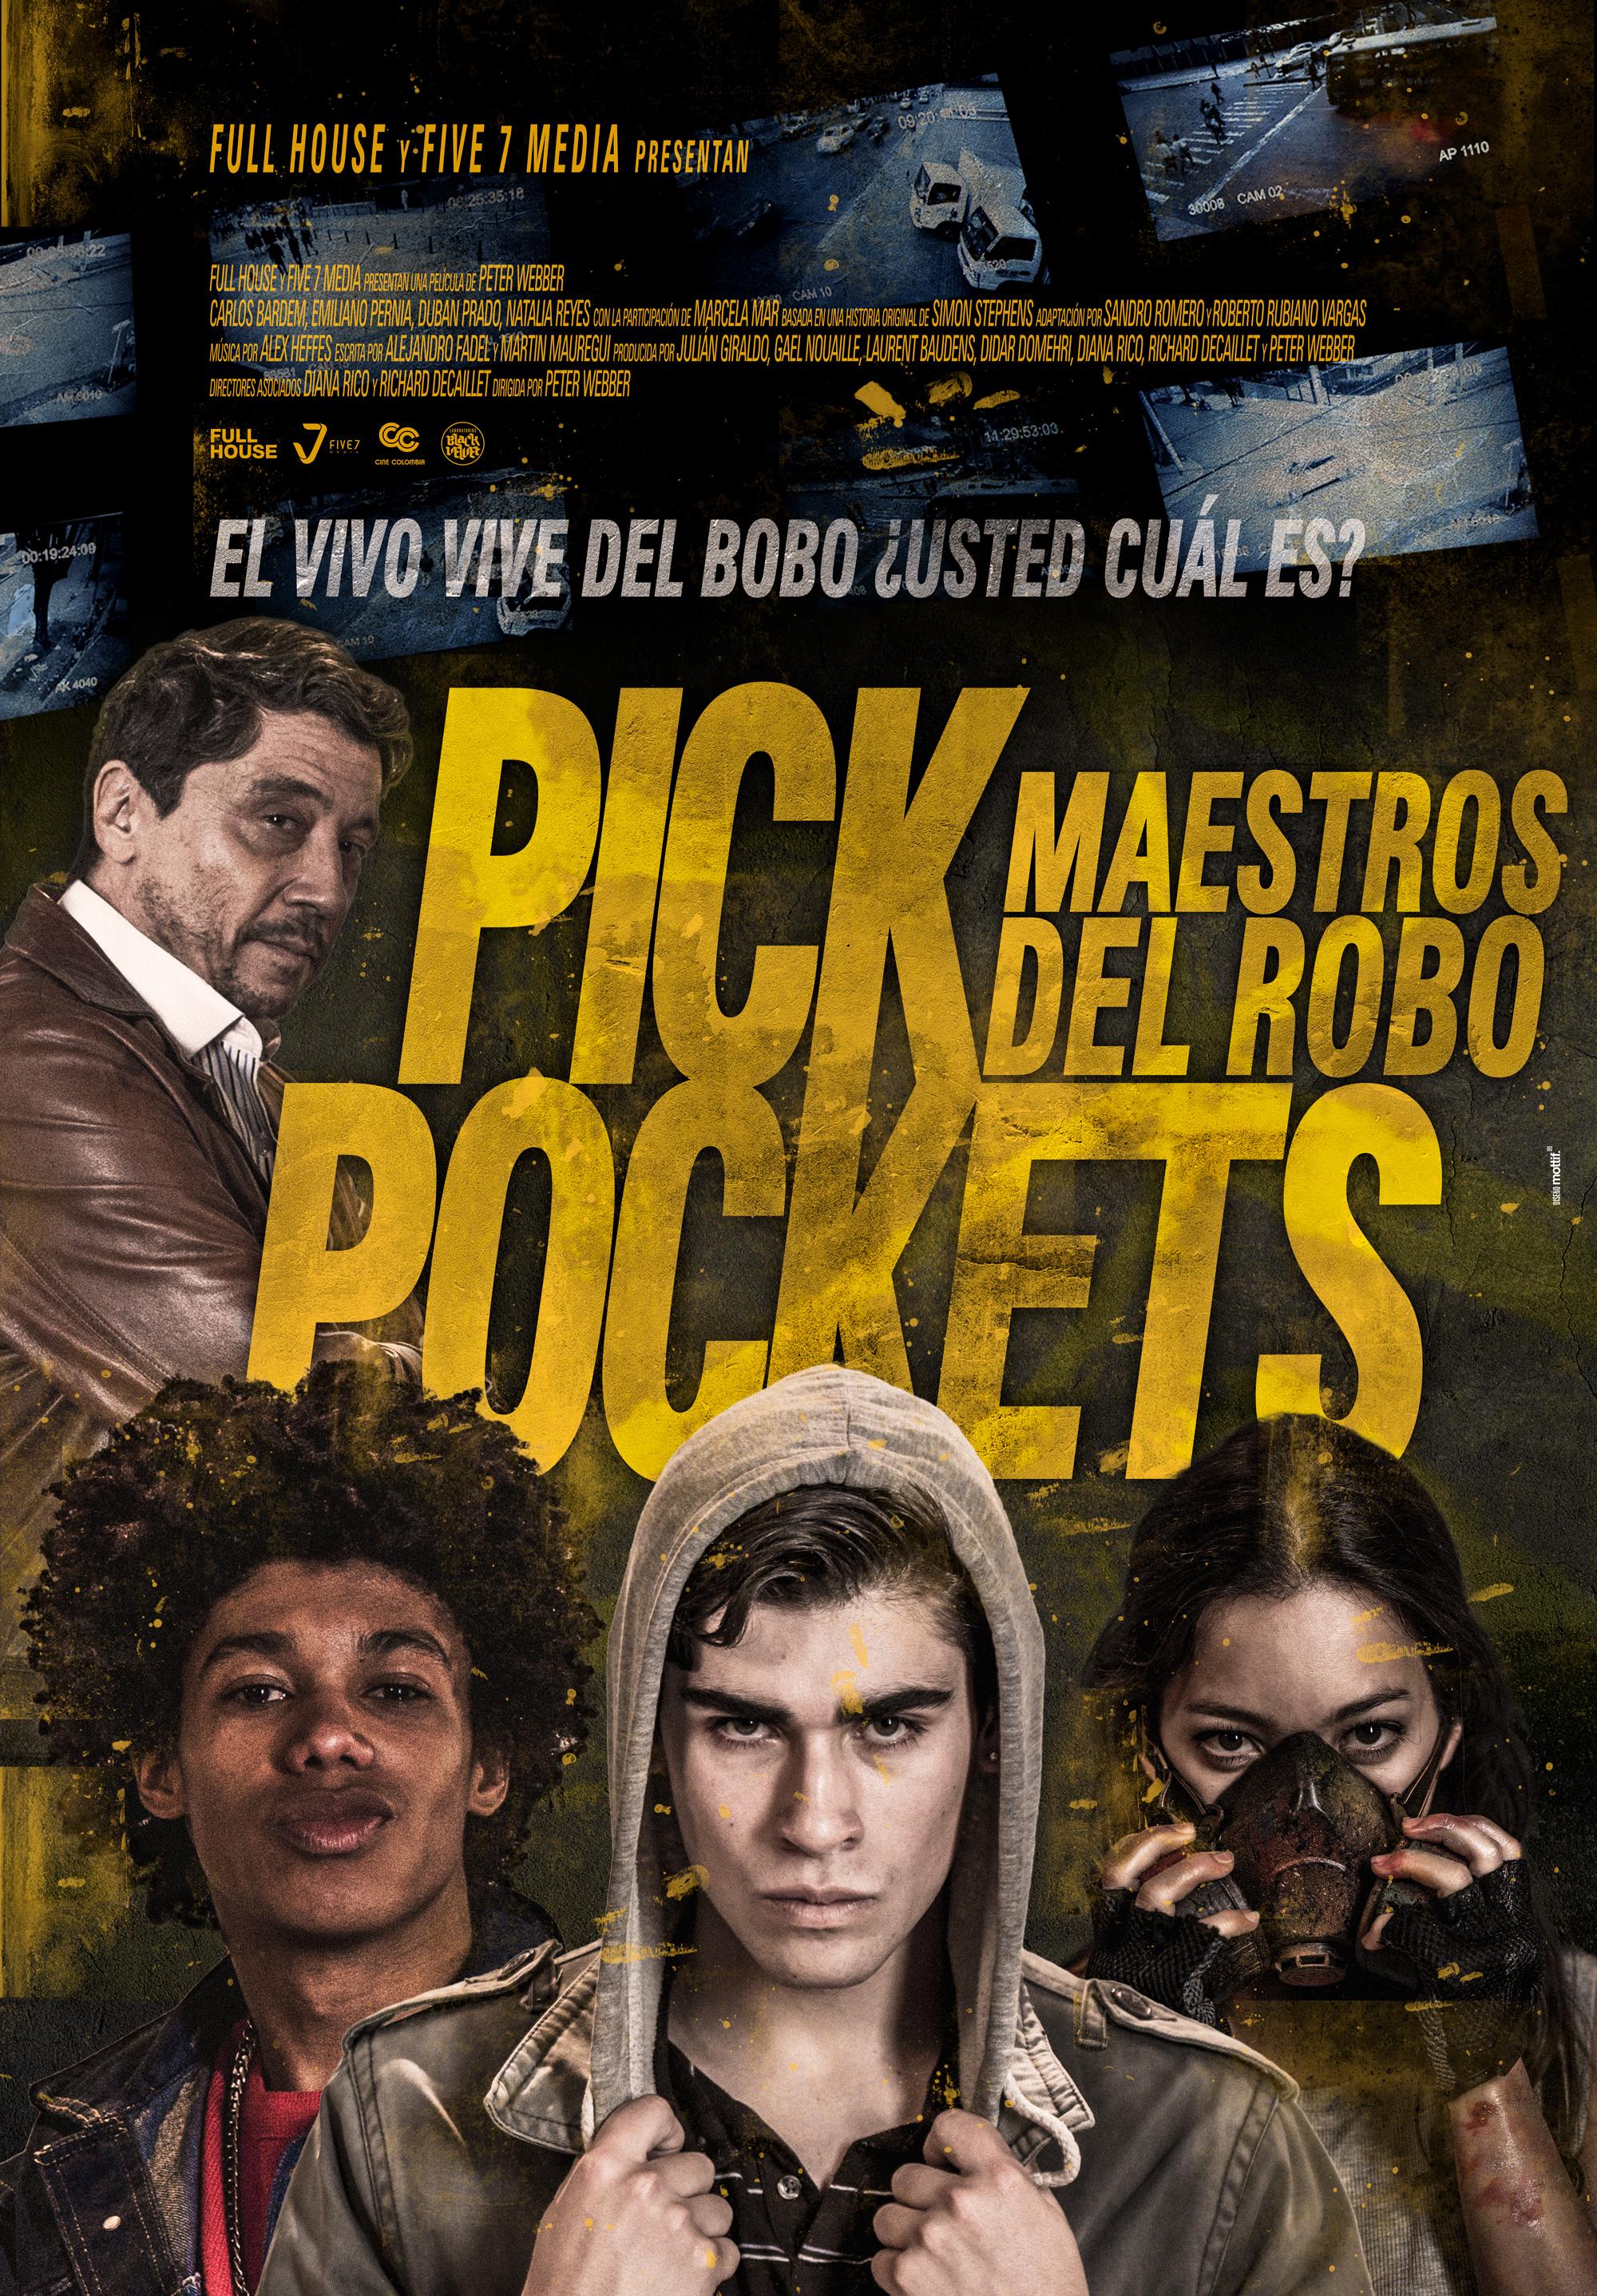 Pickpockets: Maestros del robo (2018) - IMDb